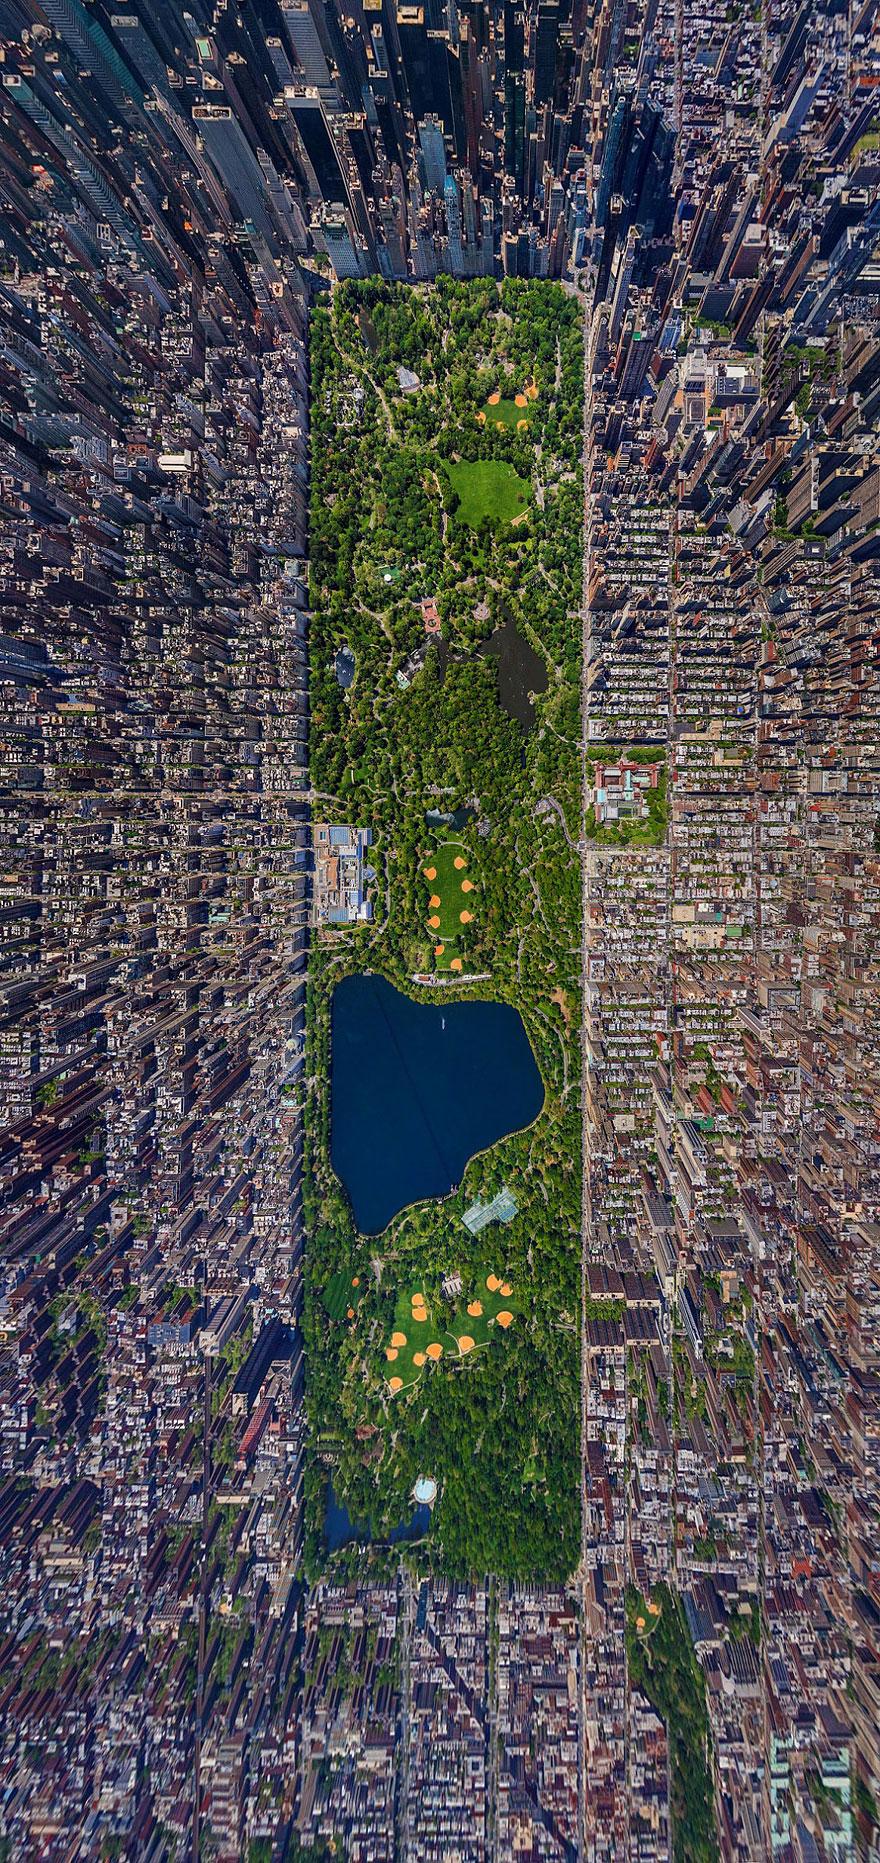 fotografias-aereas-panoramicas-airpano-19